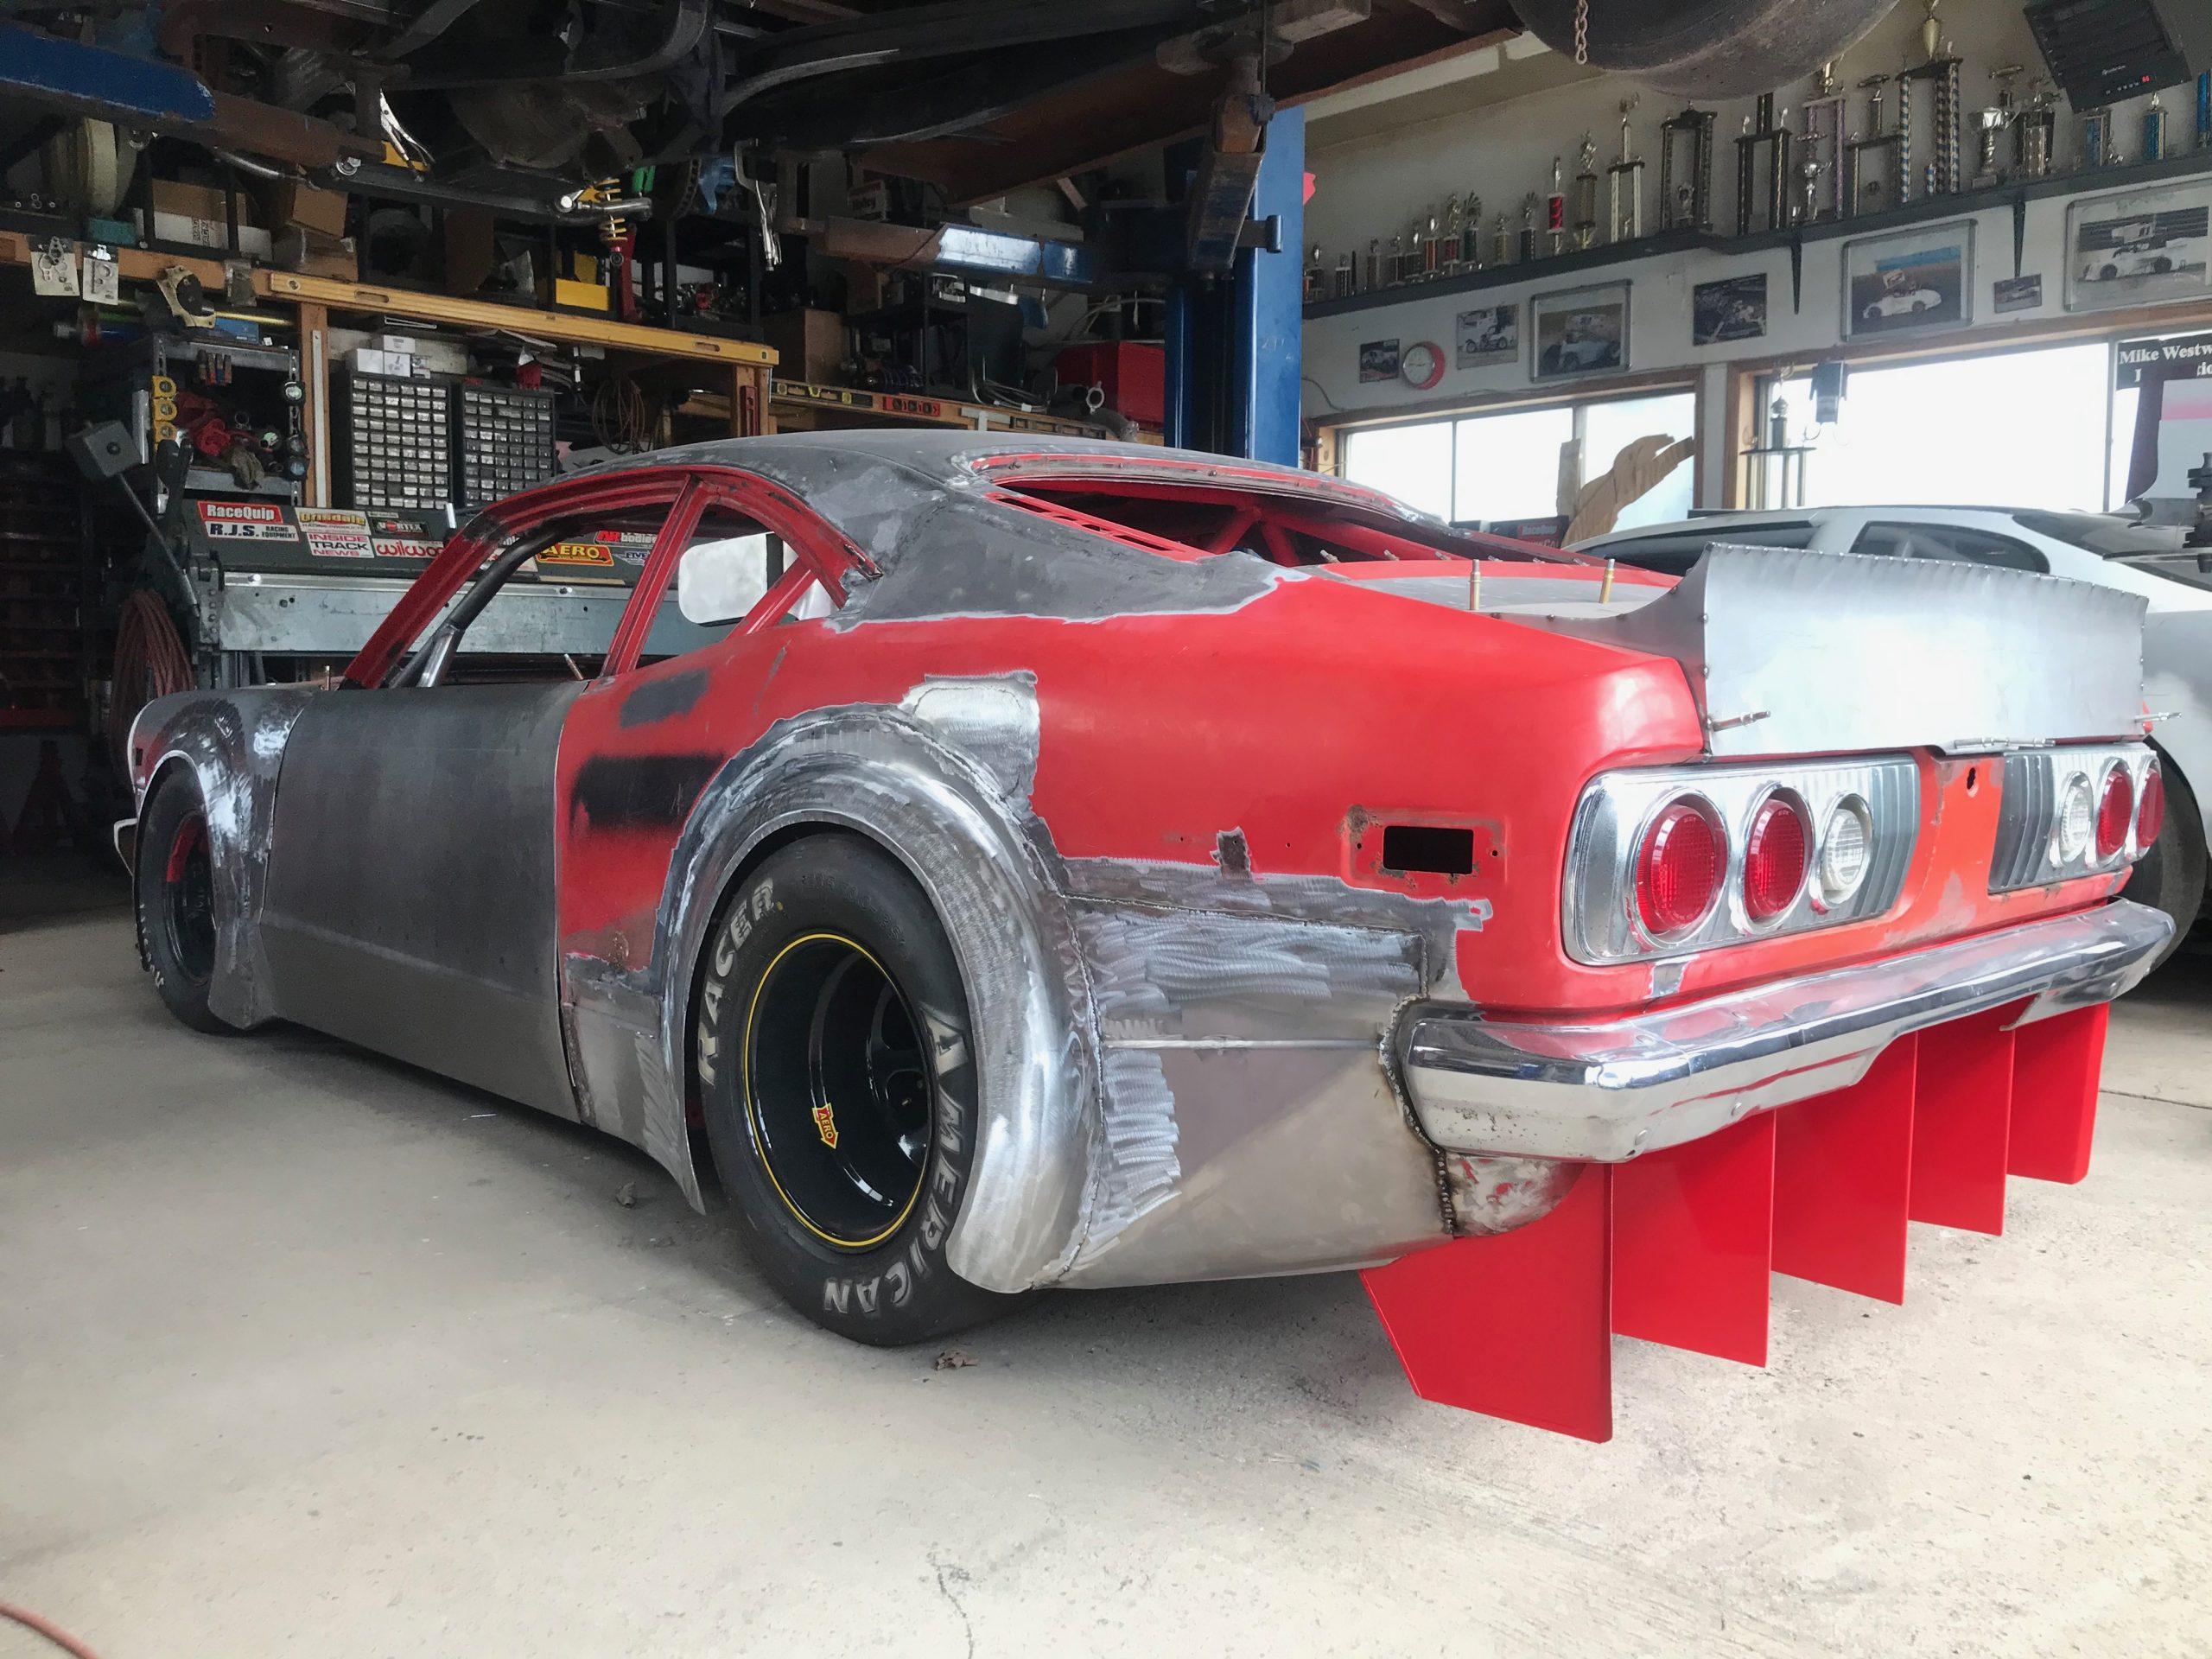 Mike Westwood RX-3 race car